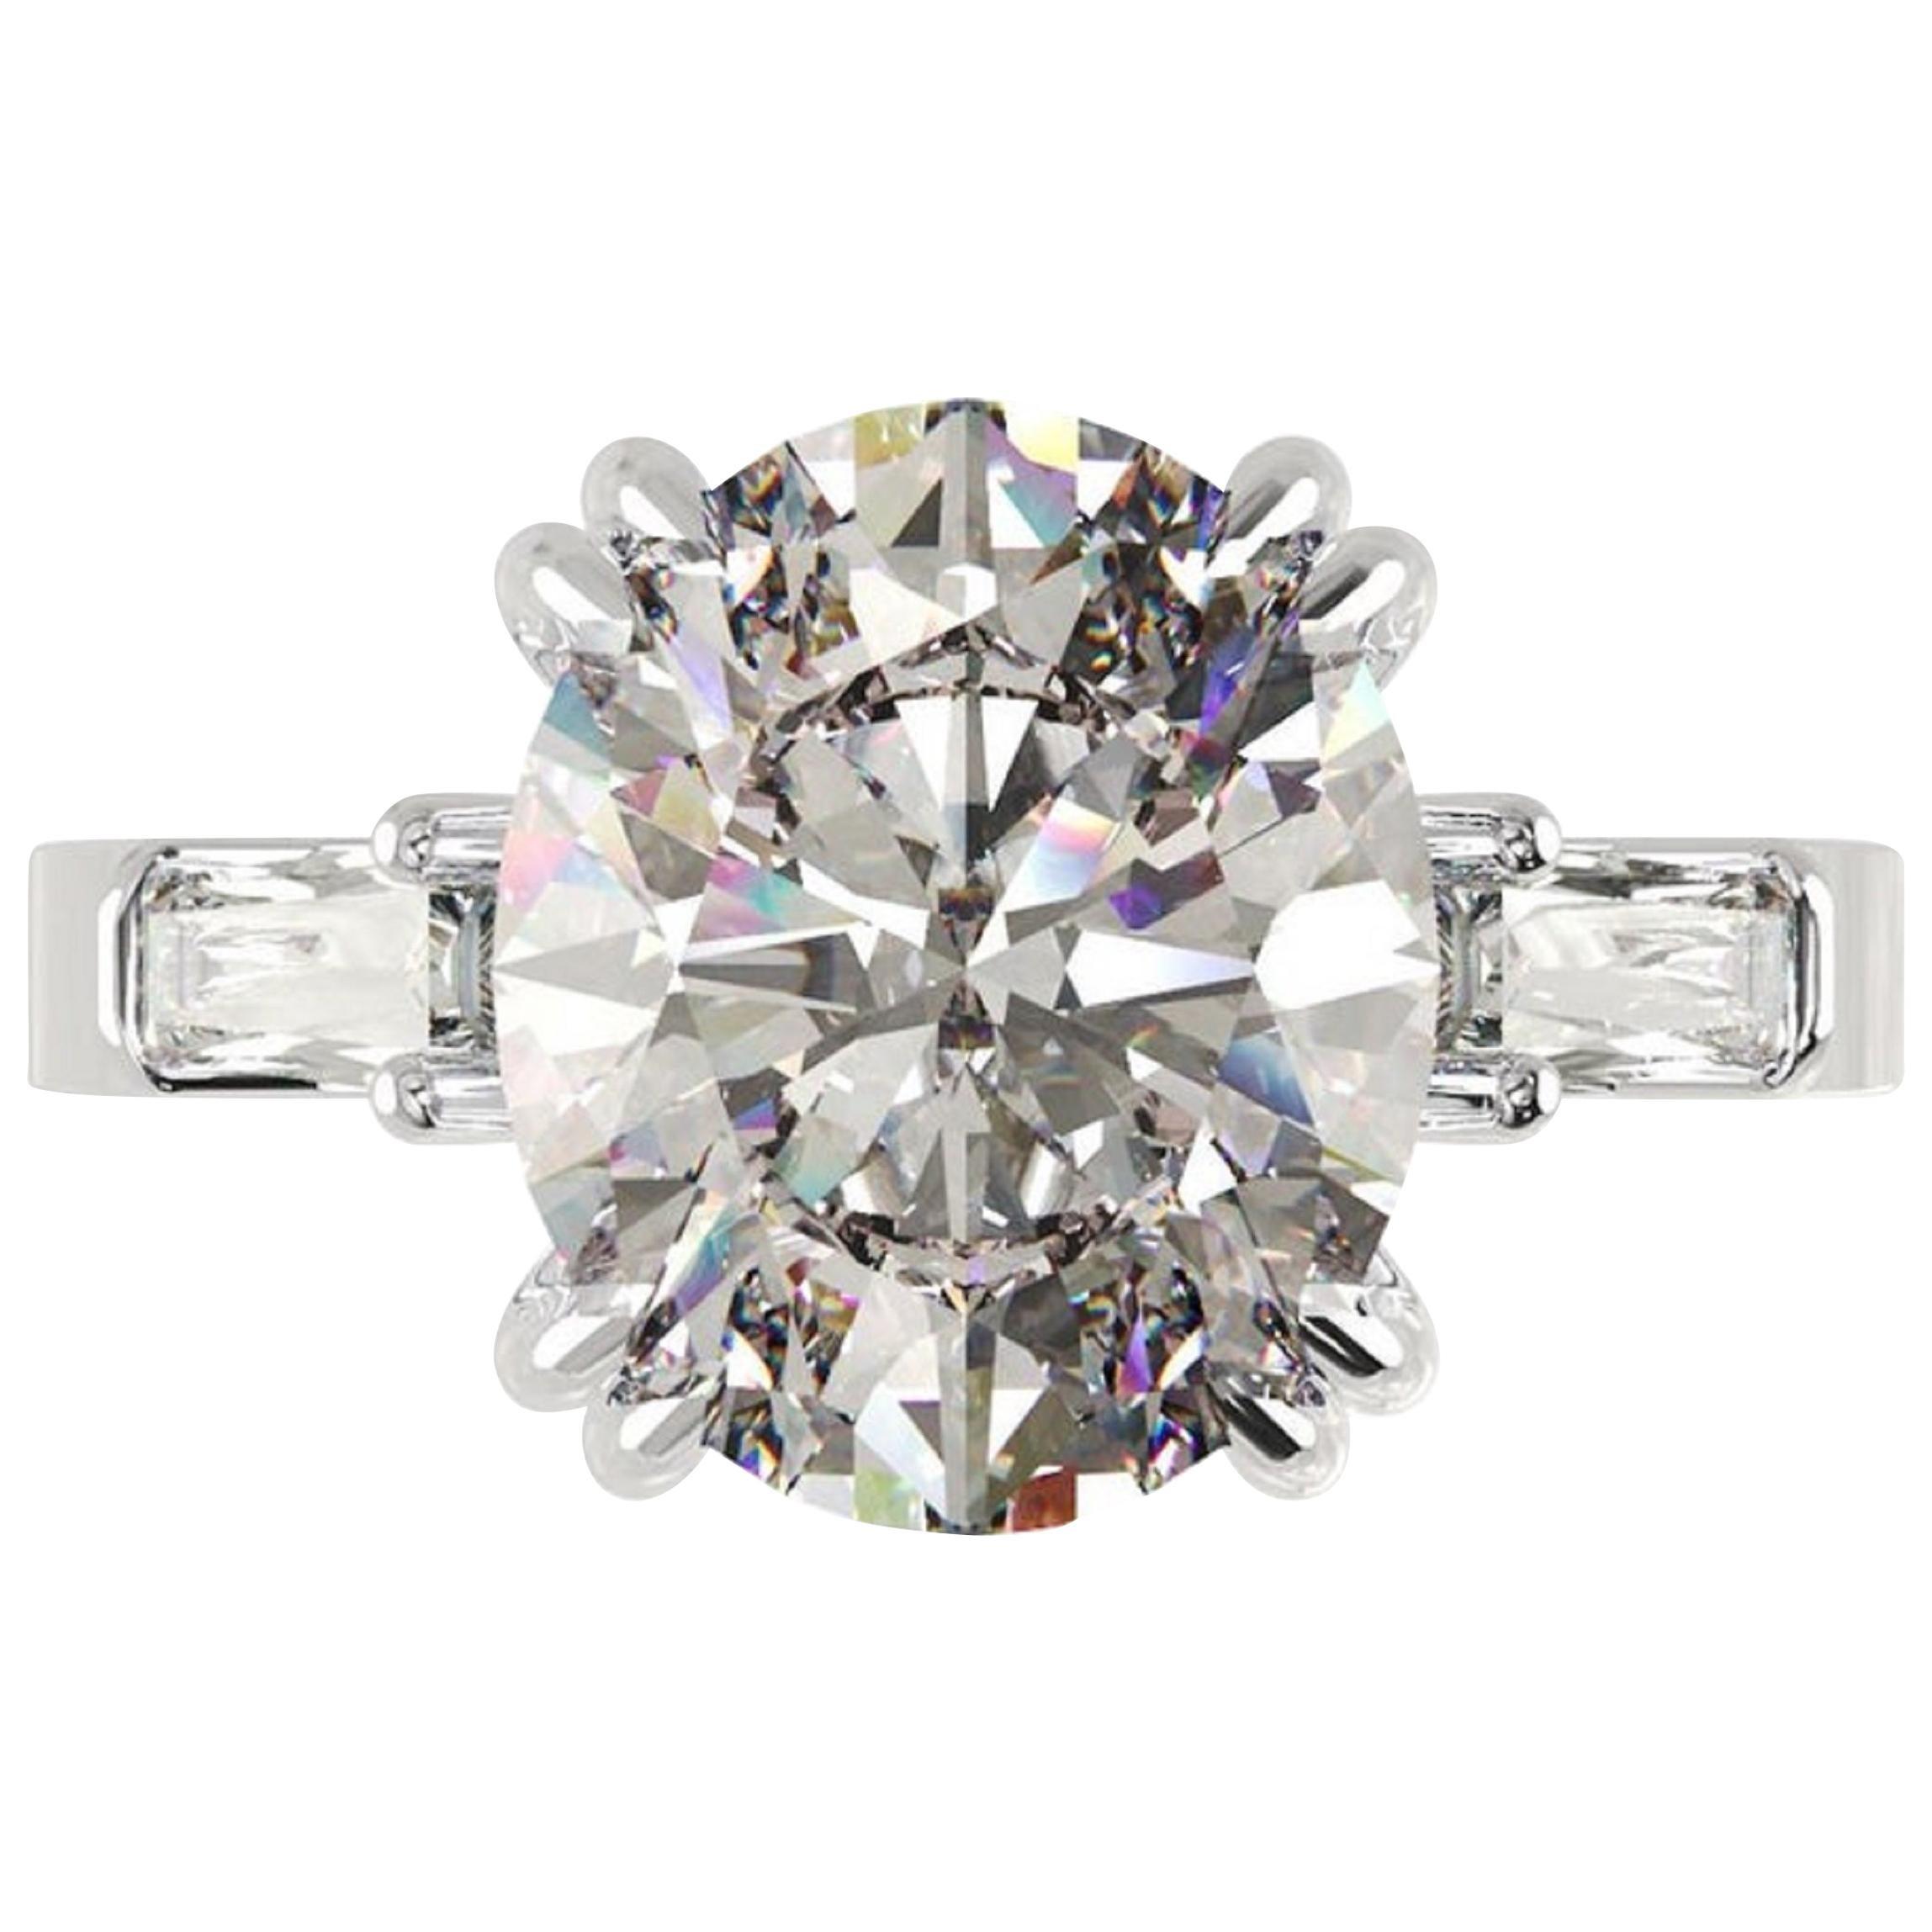 IGI Certified 3 Carat Oval Cut Diamond Ring